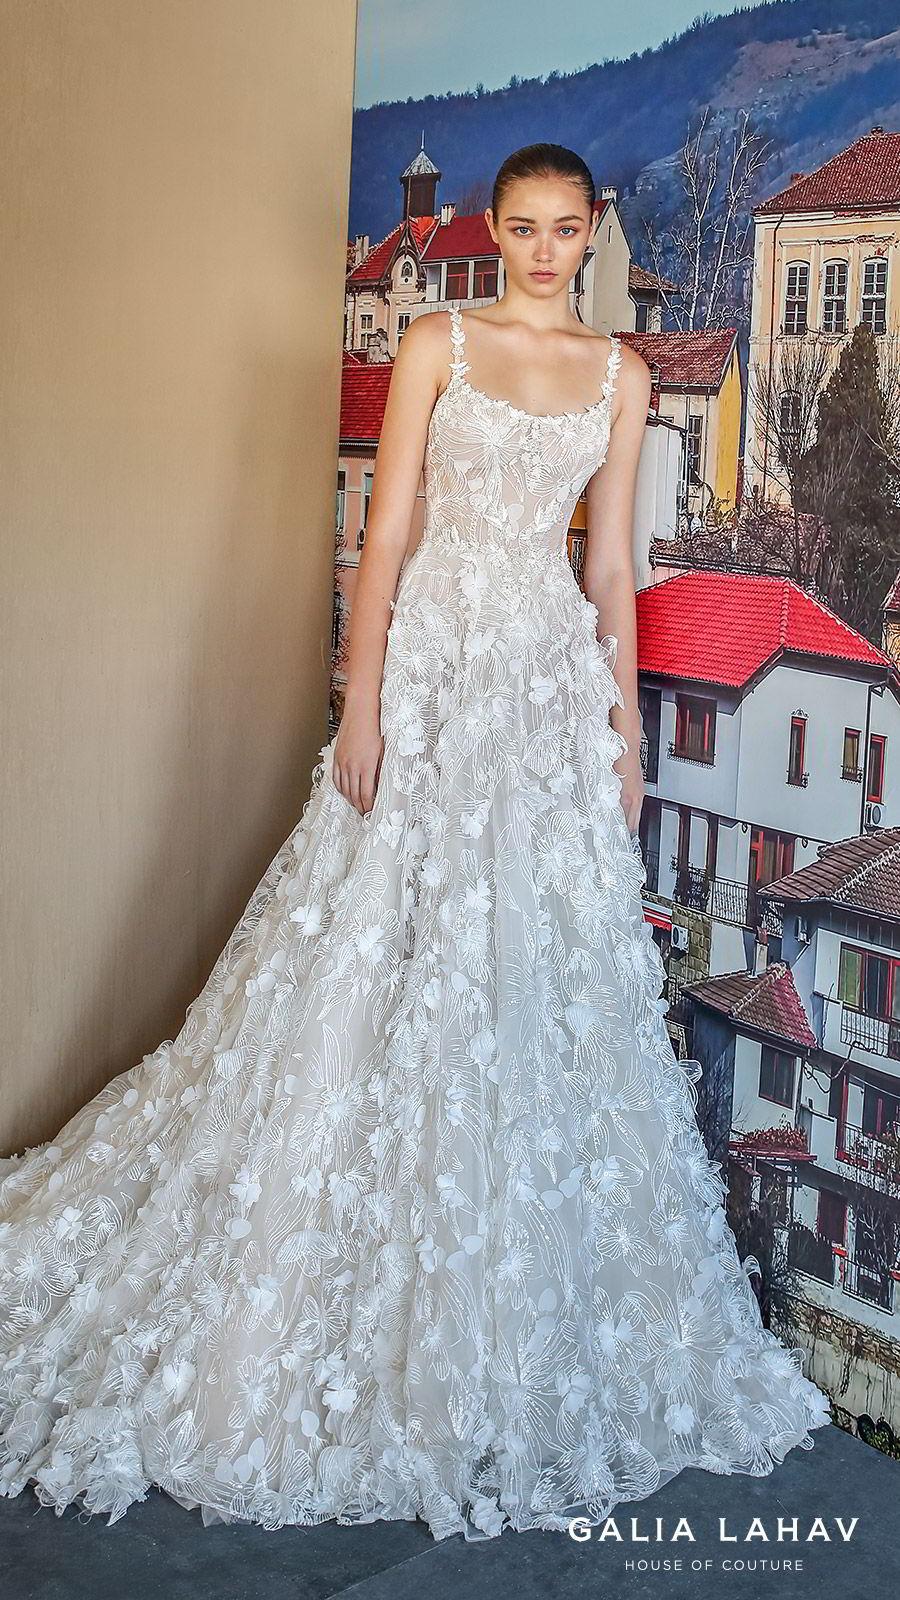 galia lahav fall 2019 bridal sleeveless straps scoop neckline fully embellished lace a line ball gown wedding dress romantic elegant chapel train (fabiana) mv